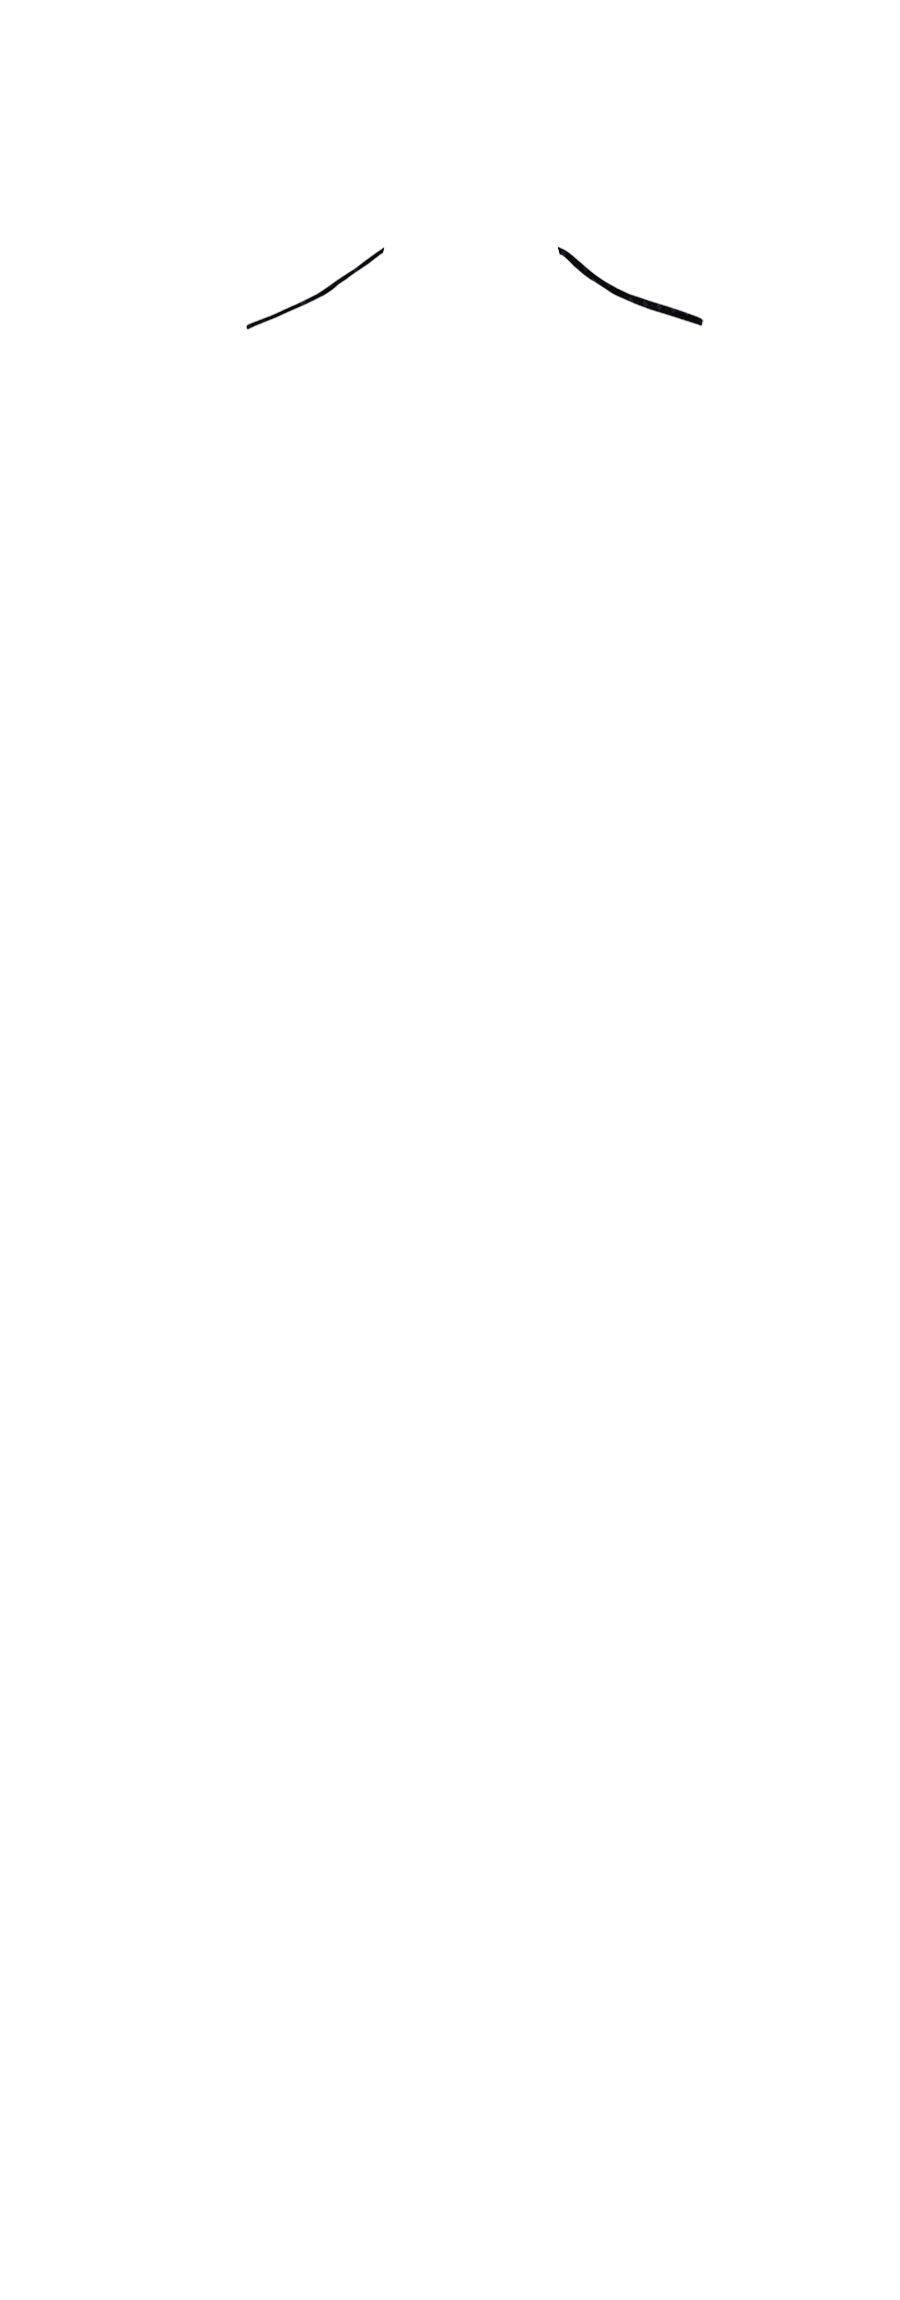 NEFL-14